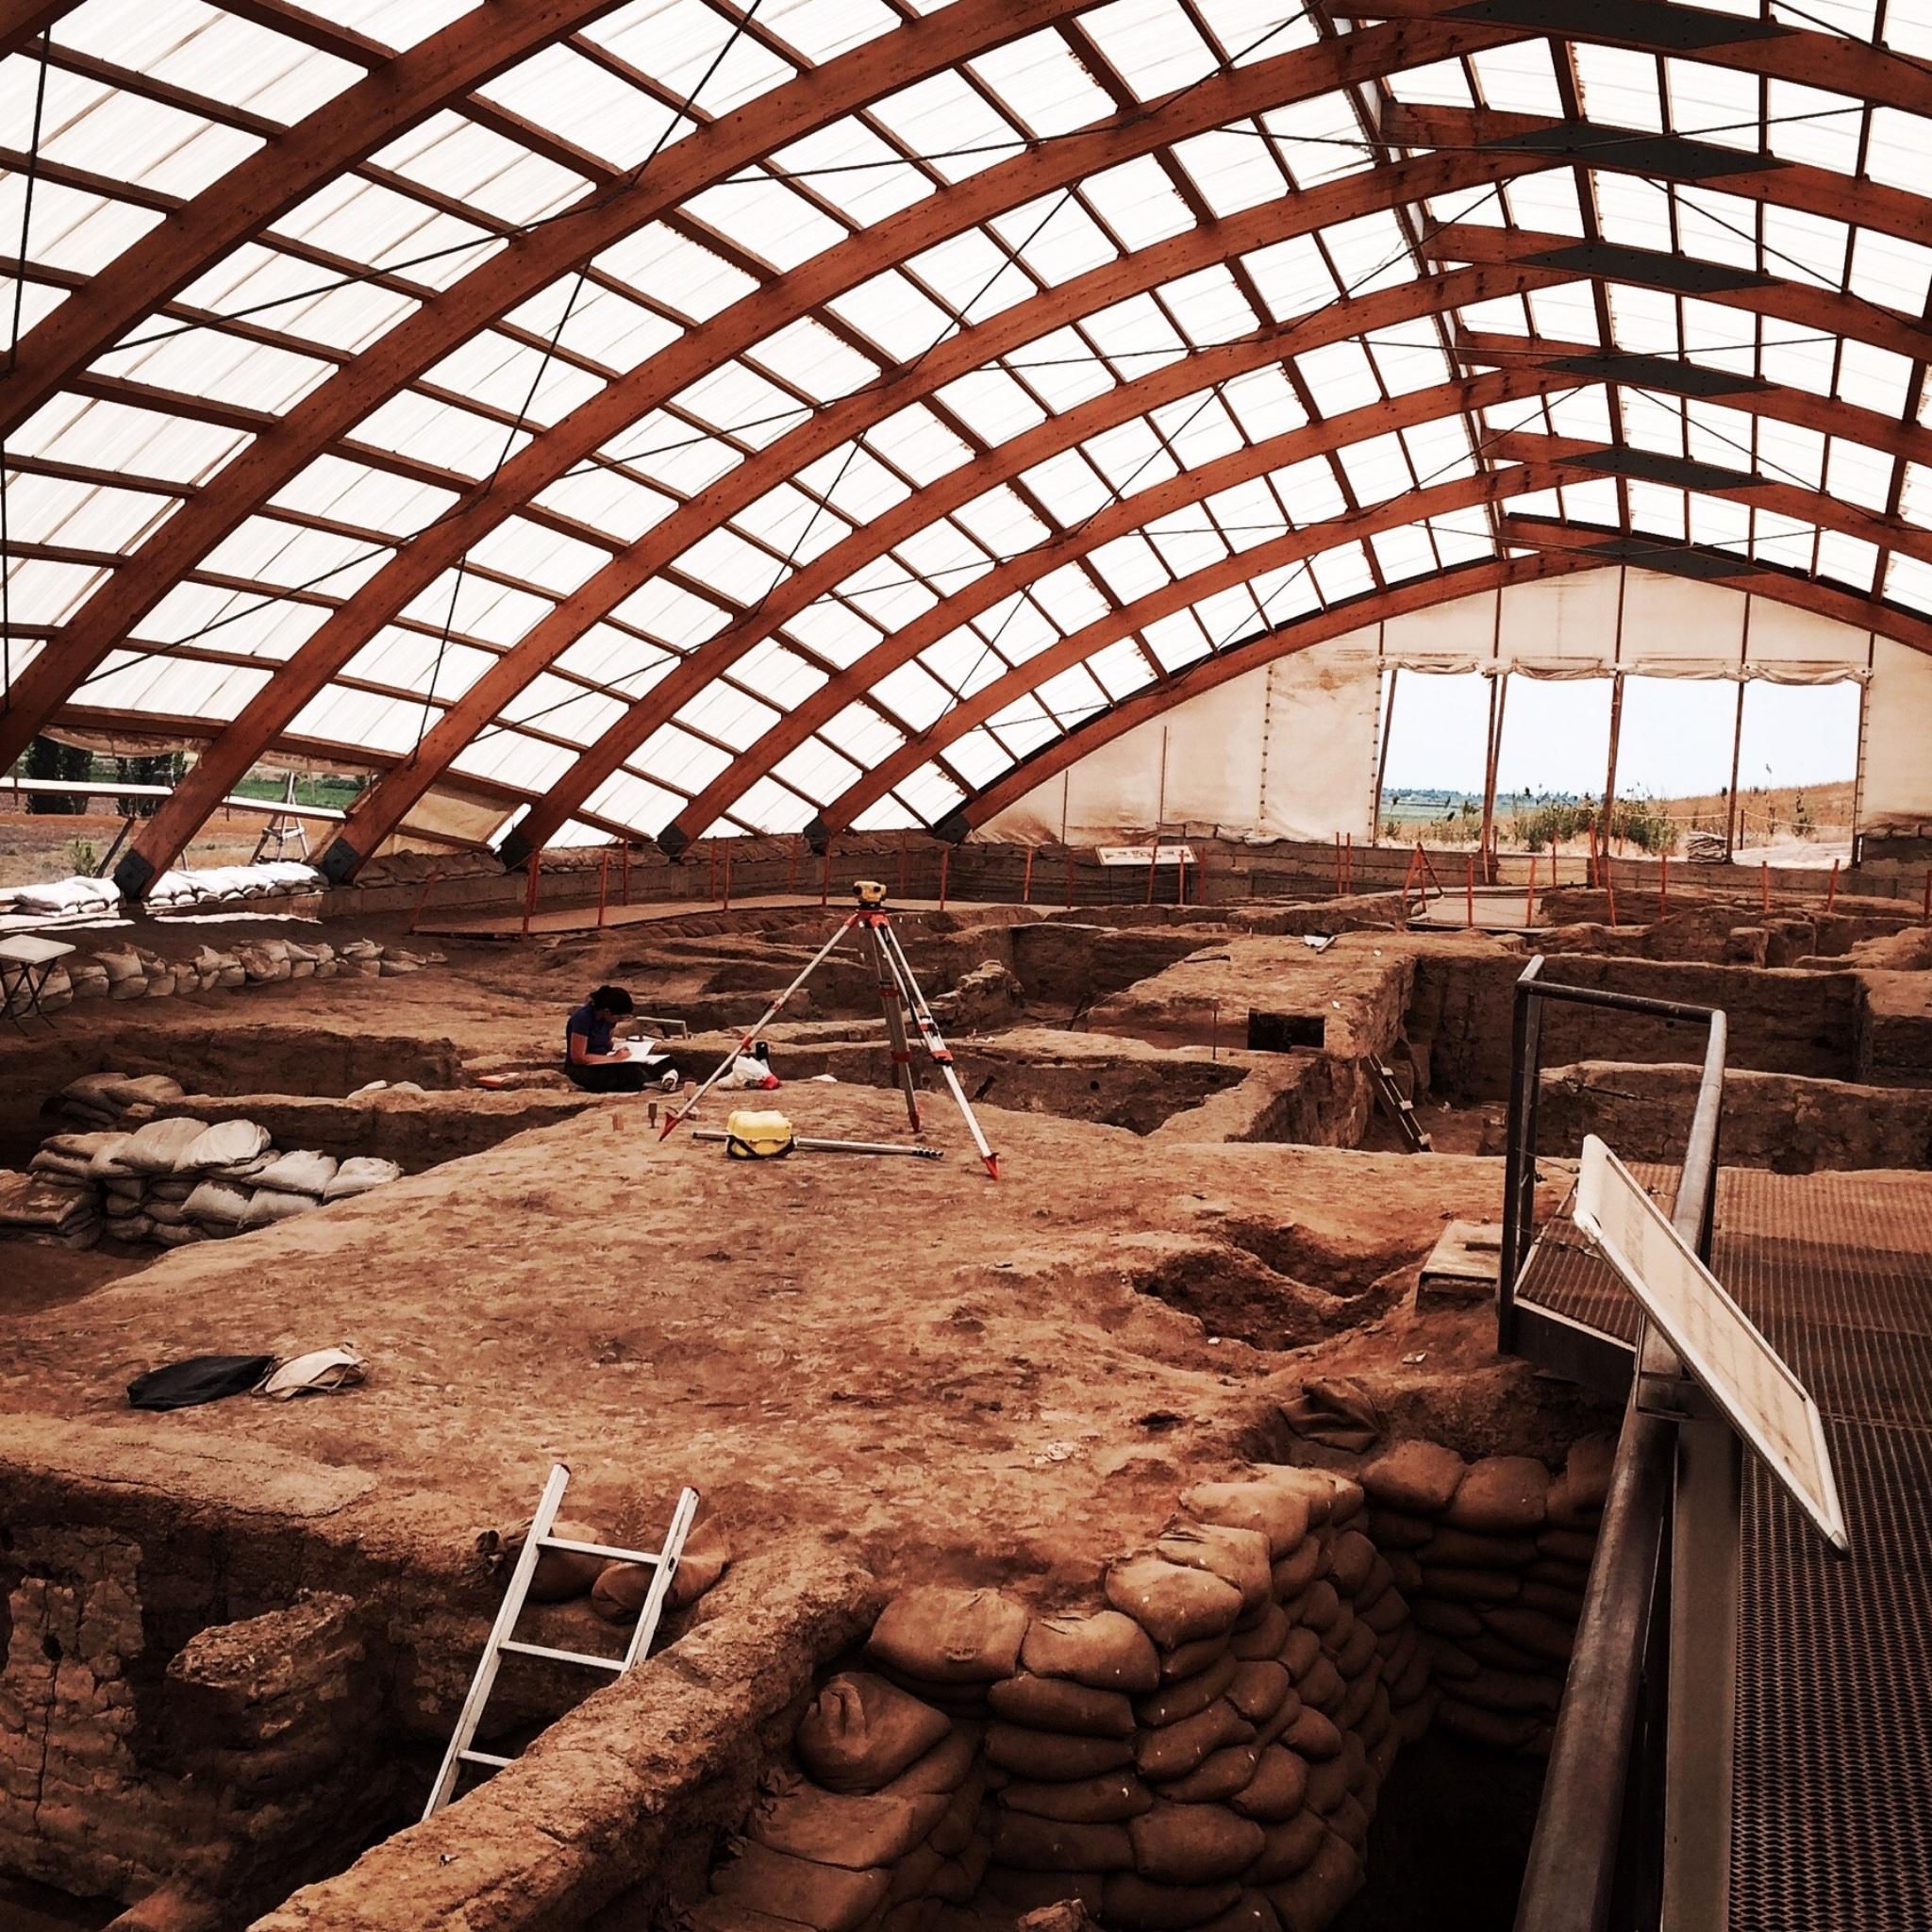 The Dig at Catalhoyuk